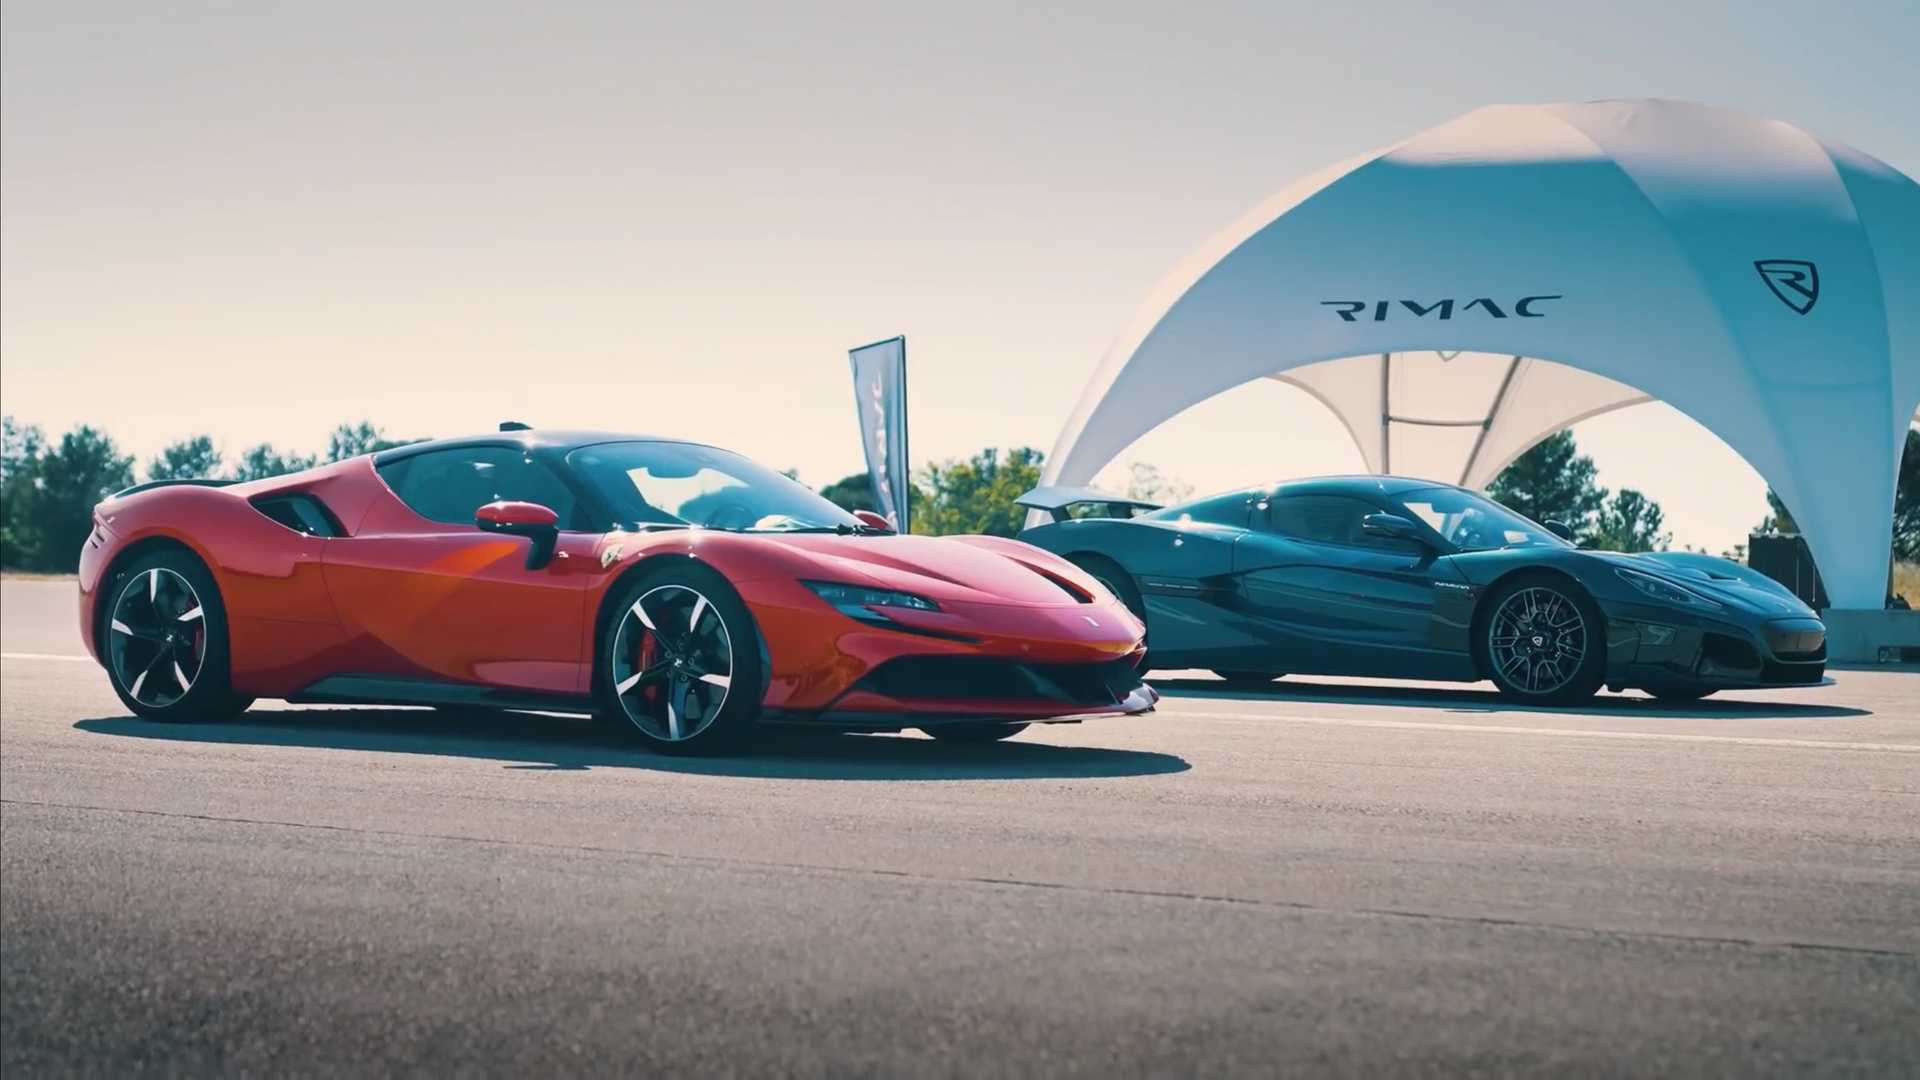 Rimac Concept One vs Ferrari SF90 Stradale at Highlands